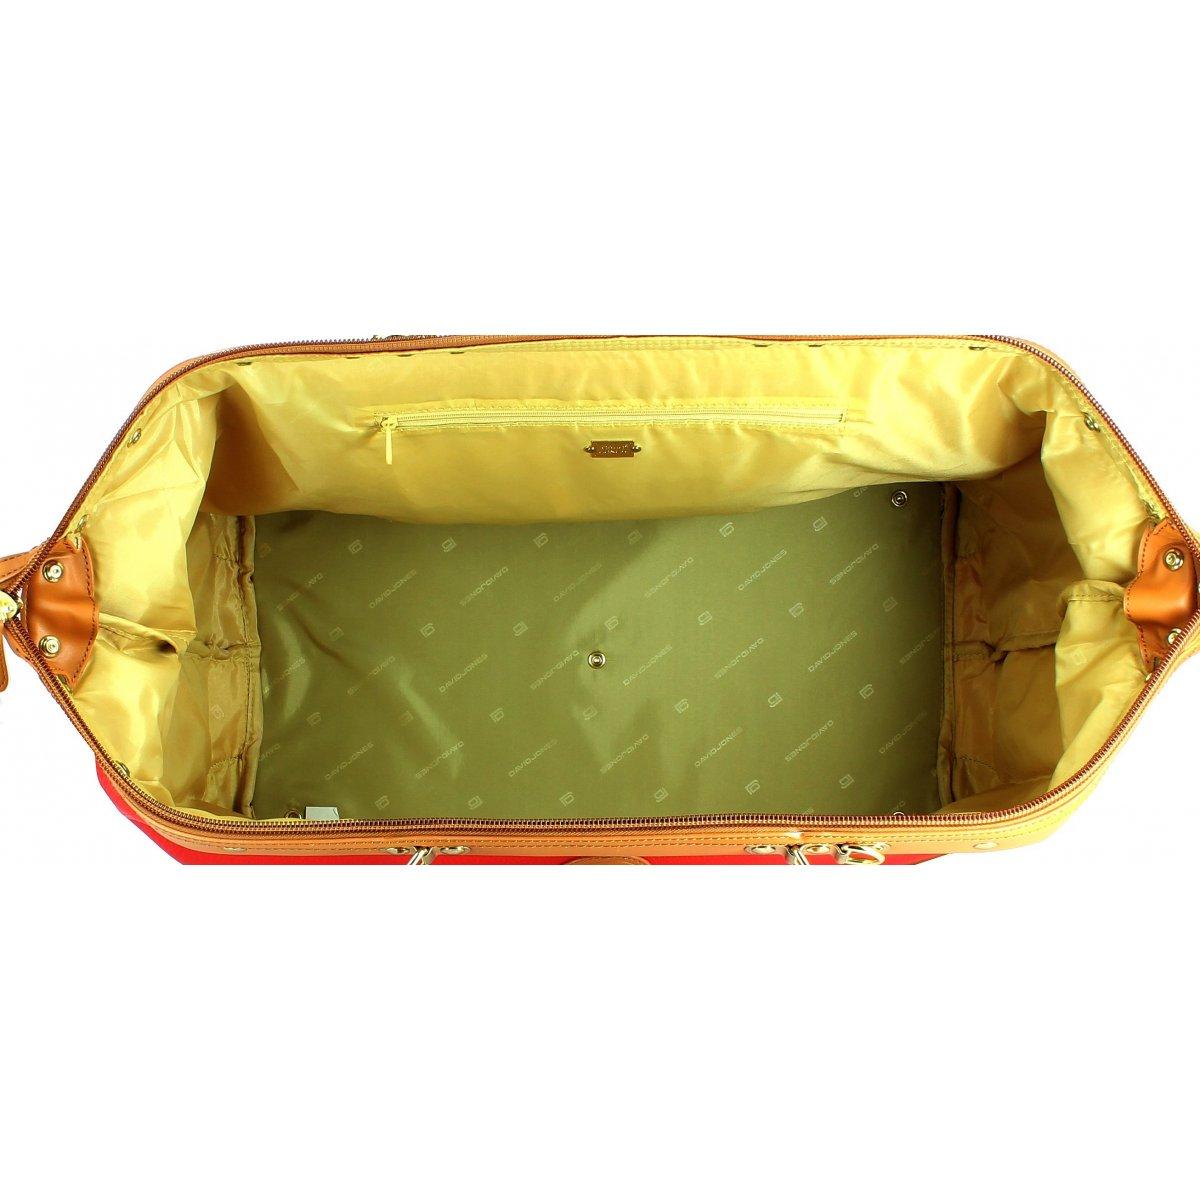 sac plastique pas cher sac a main femme transparent sac plastique transparent pas cher sac a. Black Bedroom Furniture Sets. Home Design Ideas